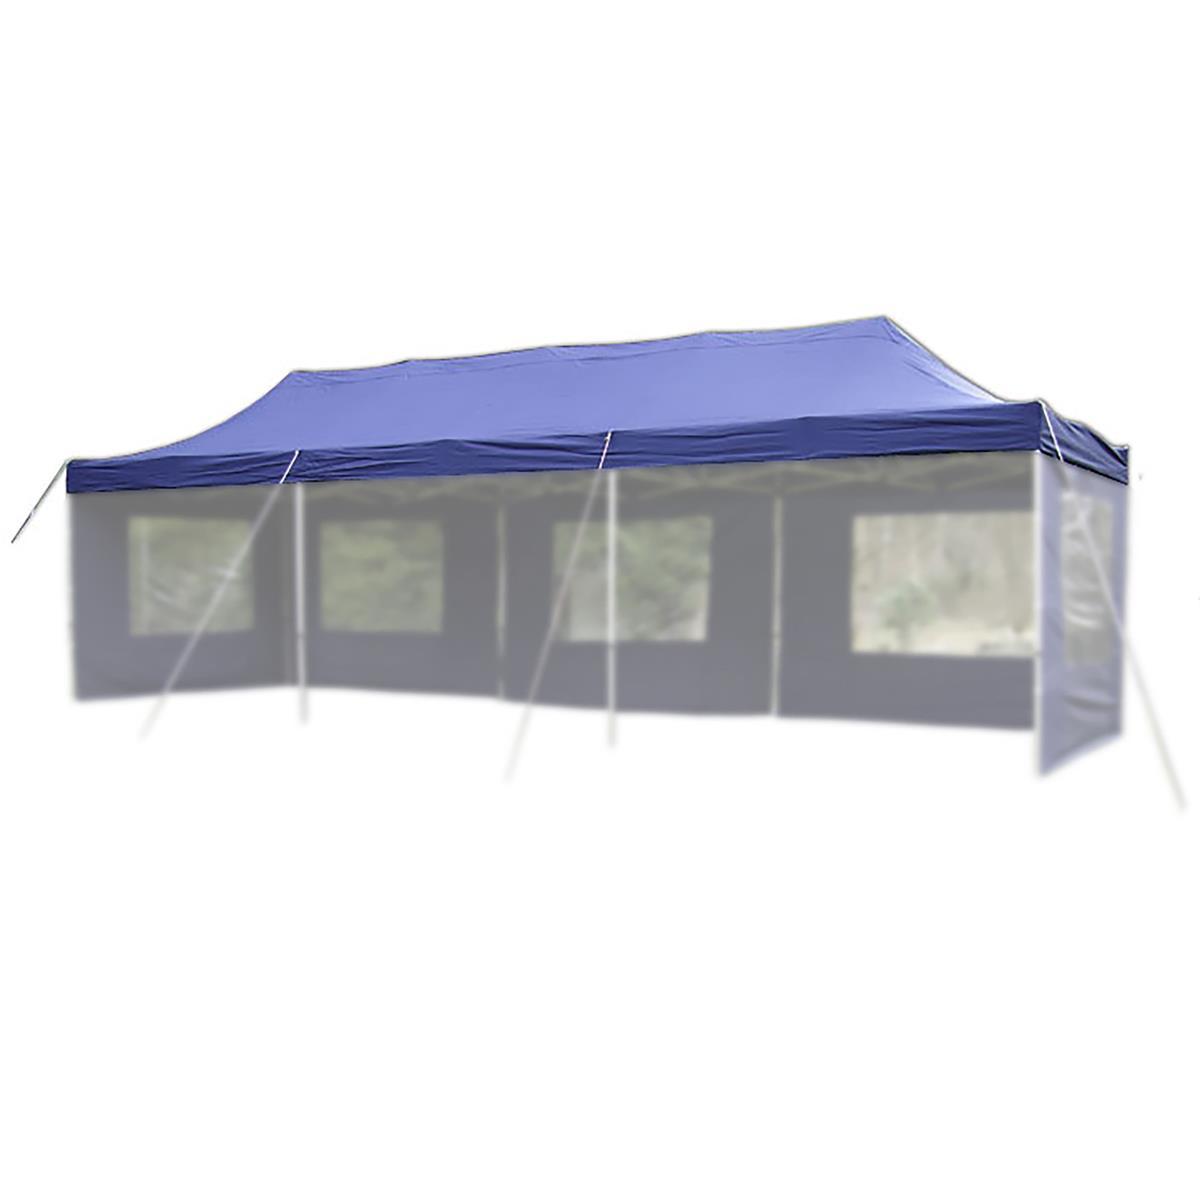 Modrá střecha 3x9 m